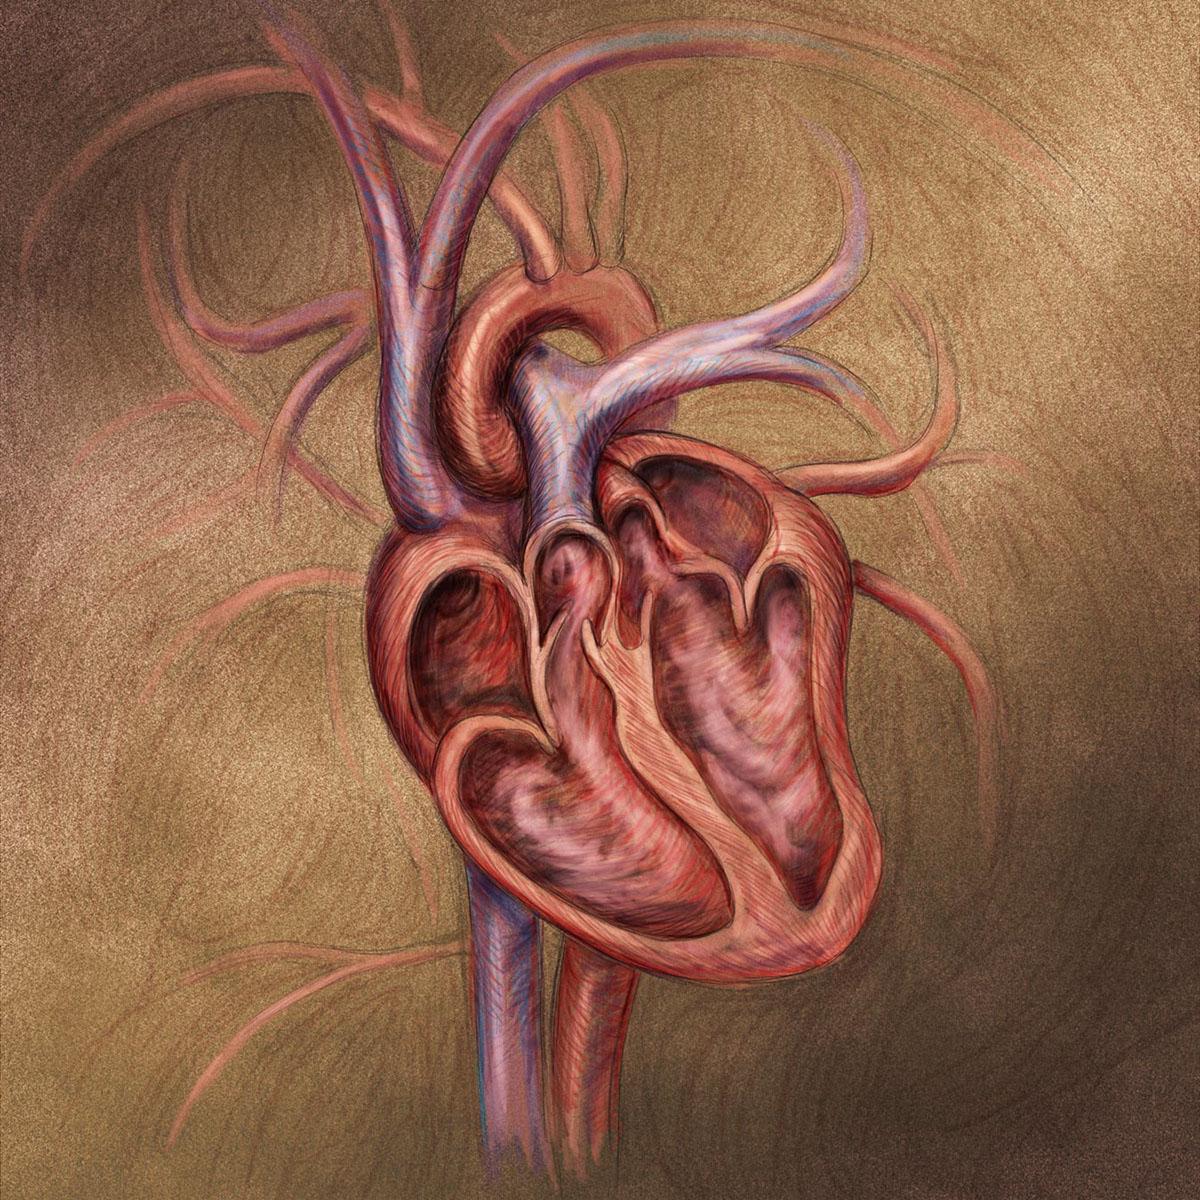 Drawn Medical Art on Behance